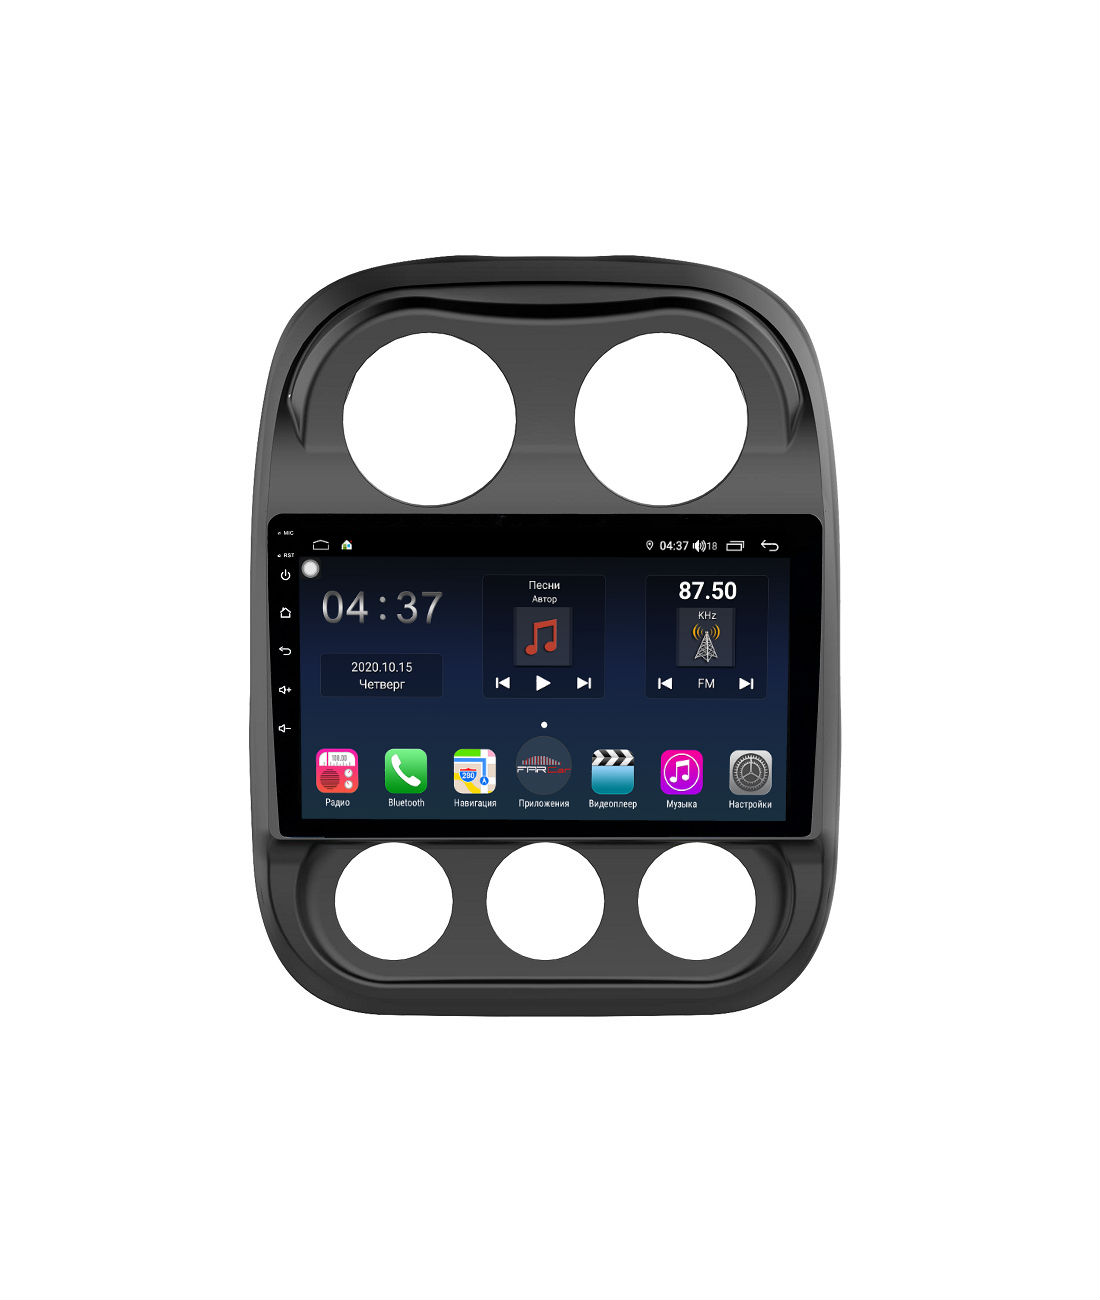 Штатная магнитола FarCar s400 для Jeep Compass I, Liberty на Android (TG1078R) (+ Камера заднего вида в подарок!)